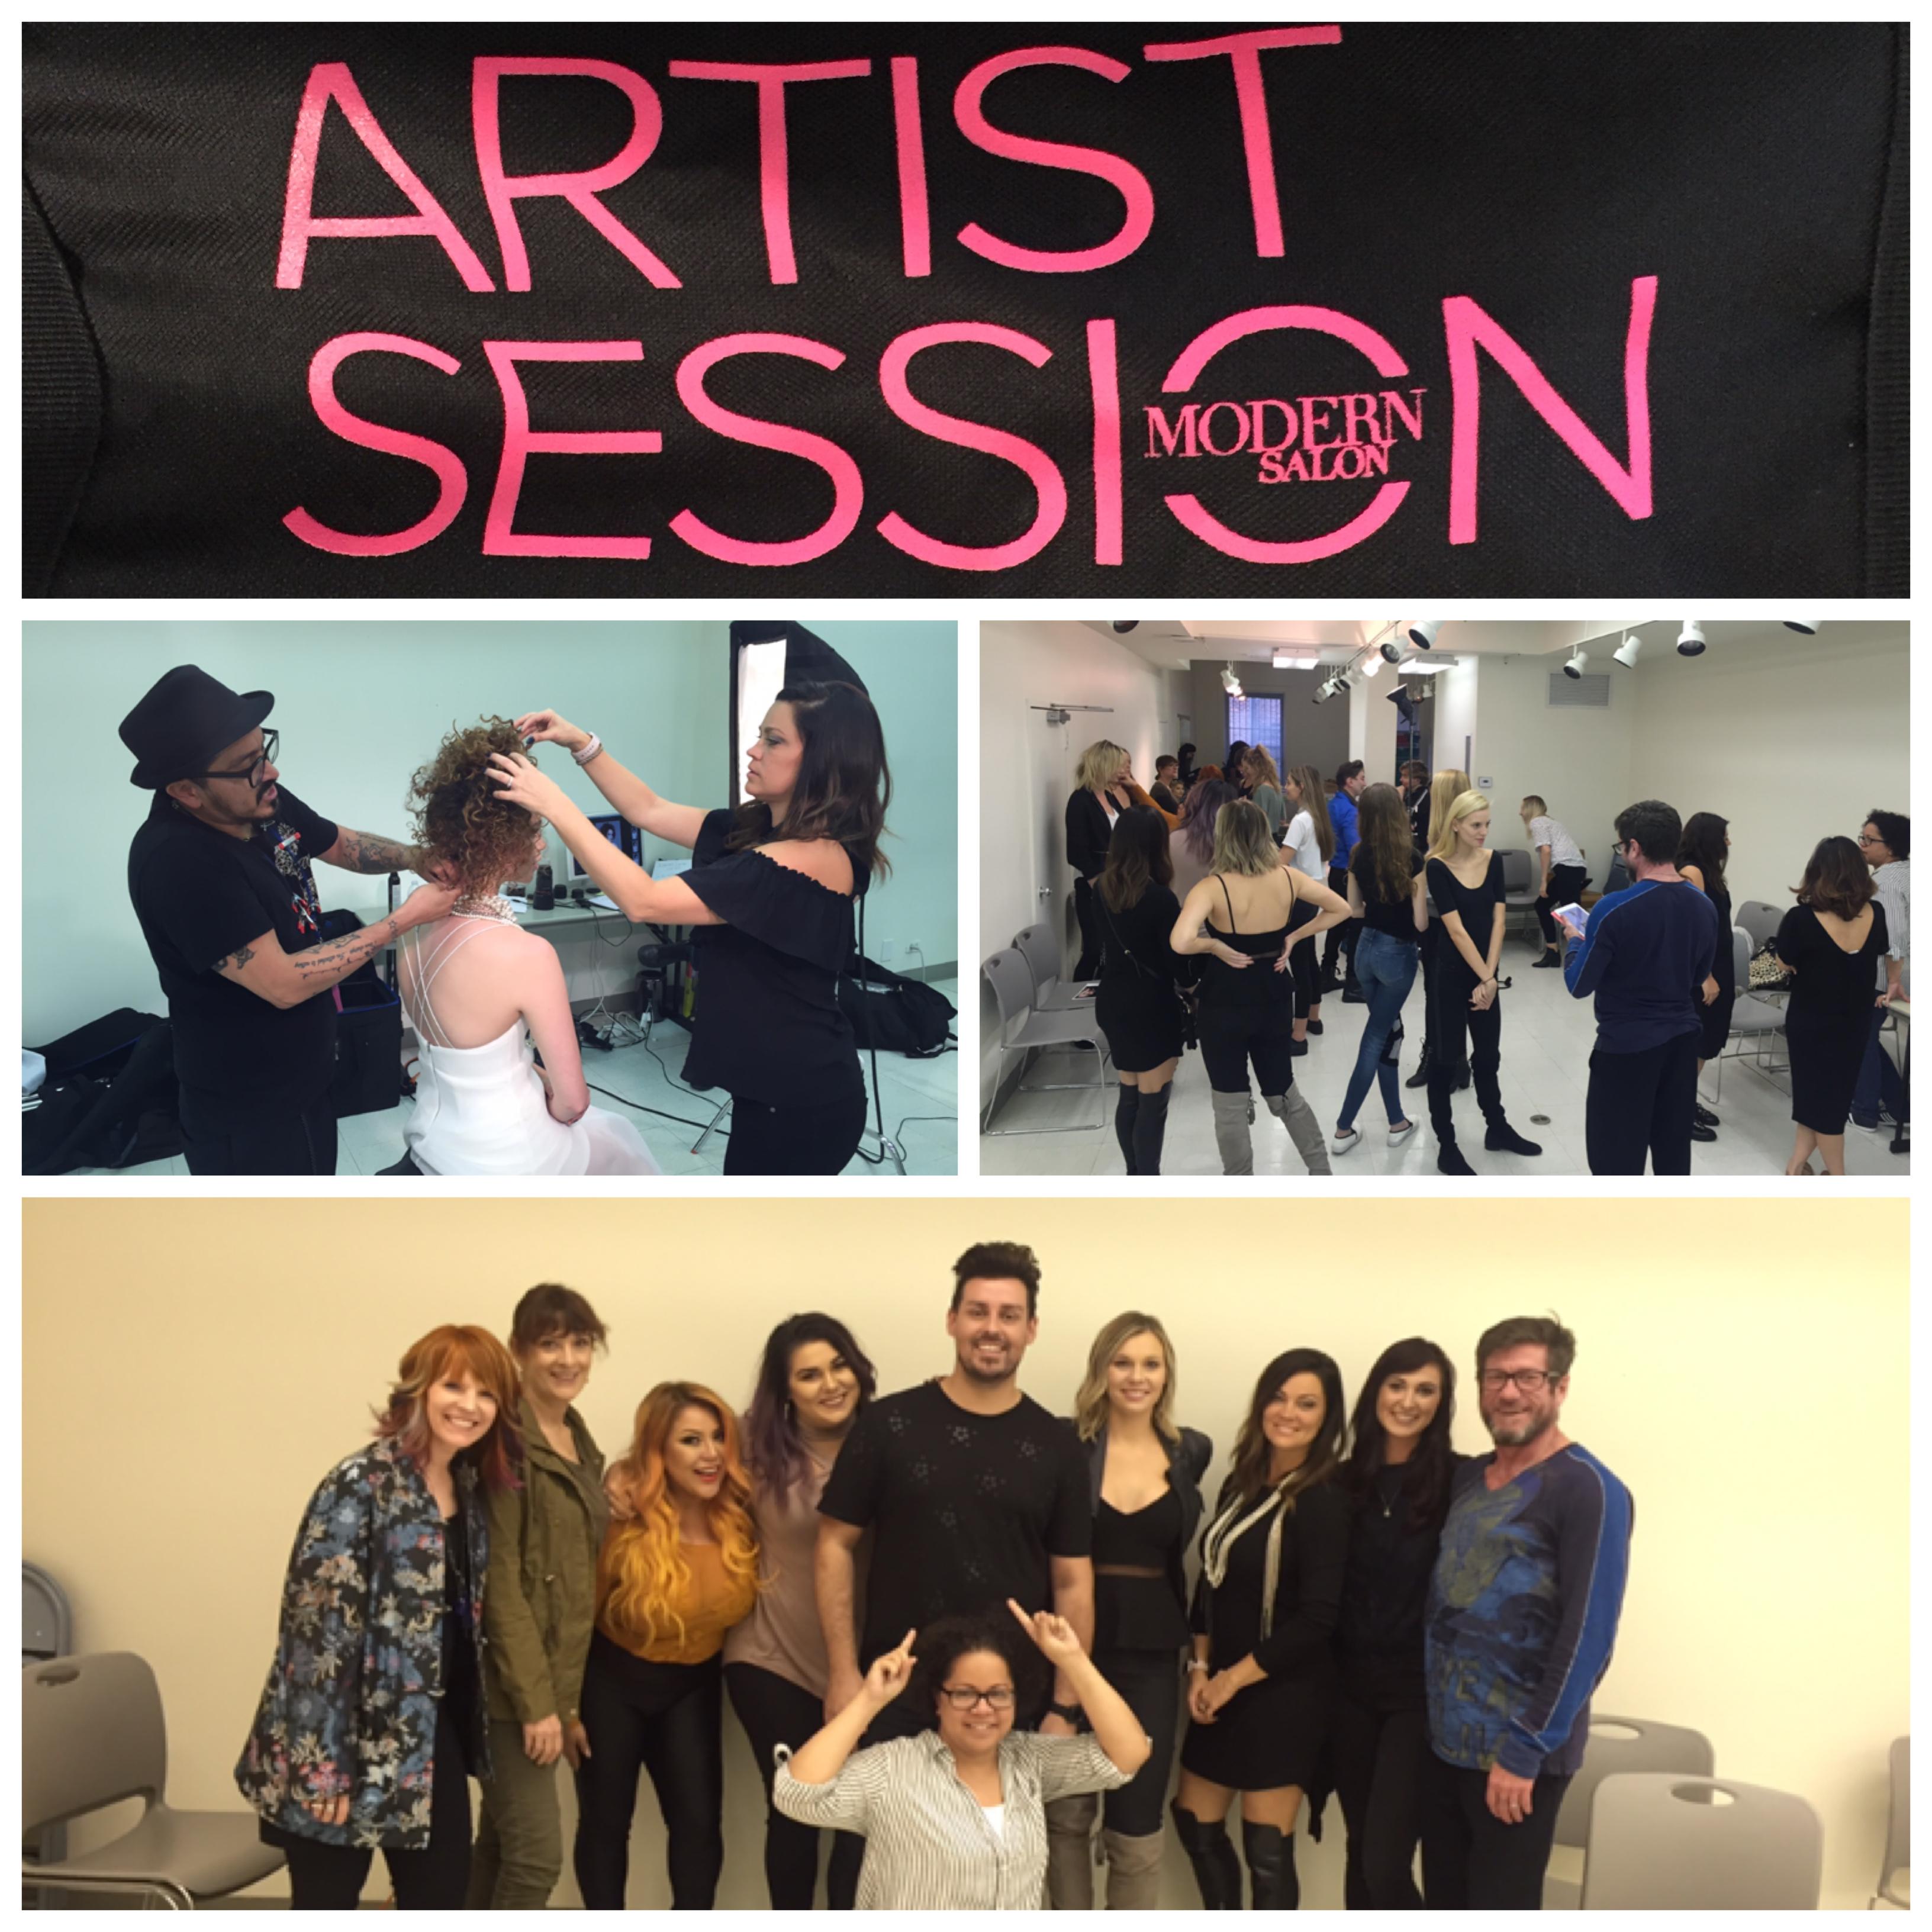 ARTIST SESSION, Fall 2017 - Having Fun!